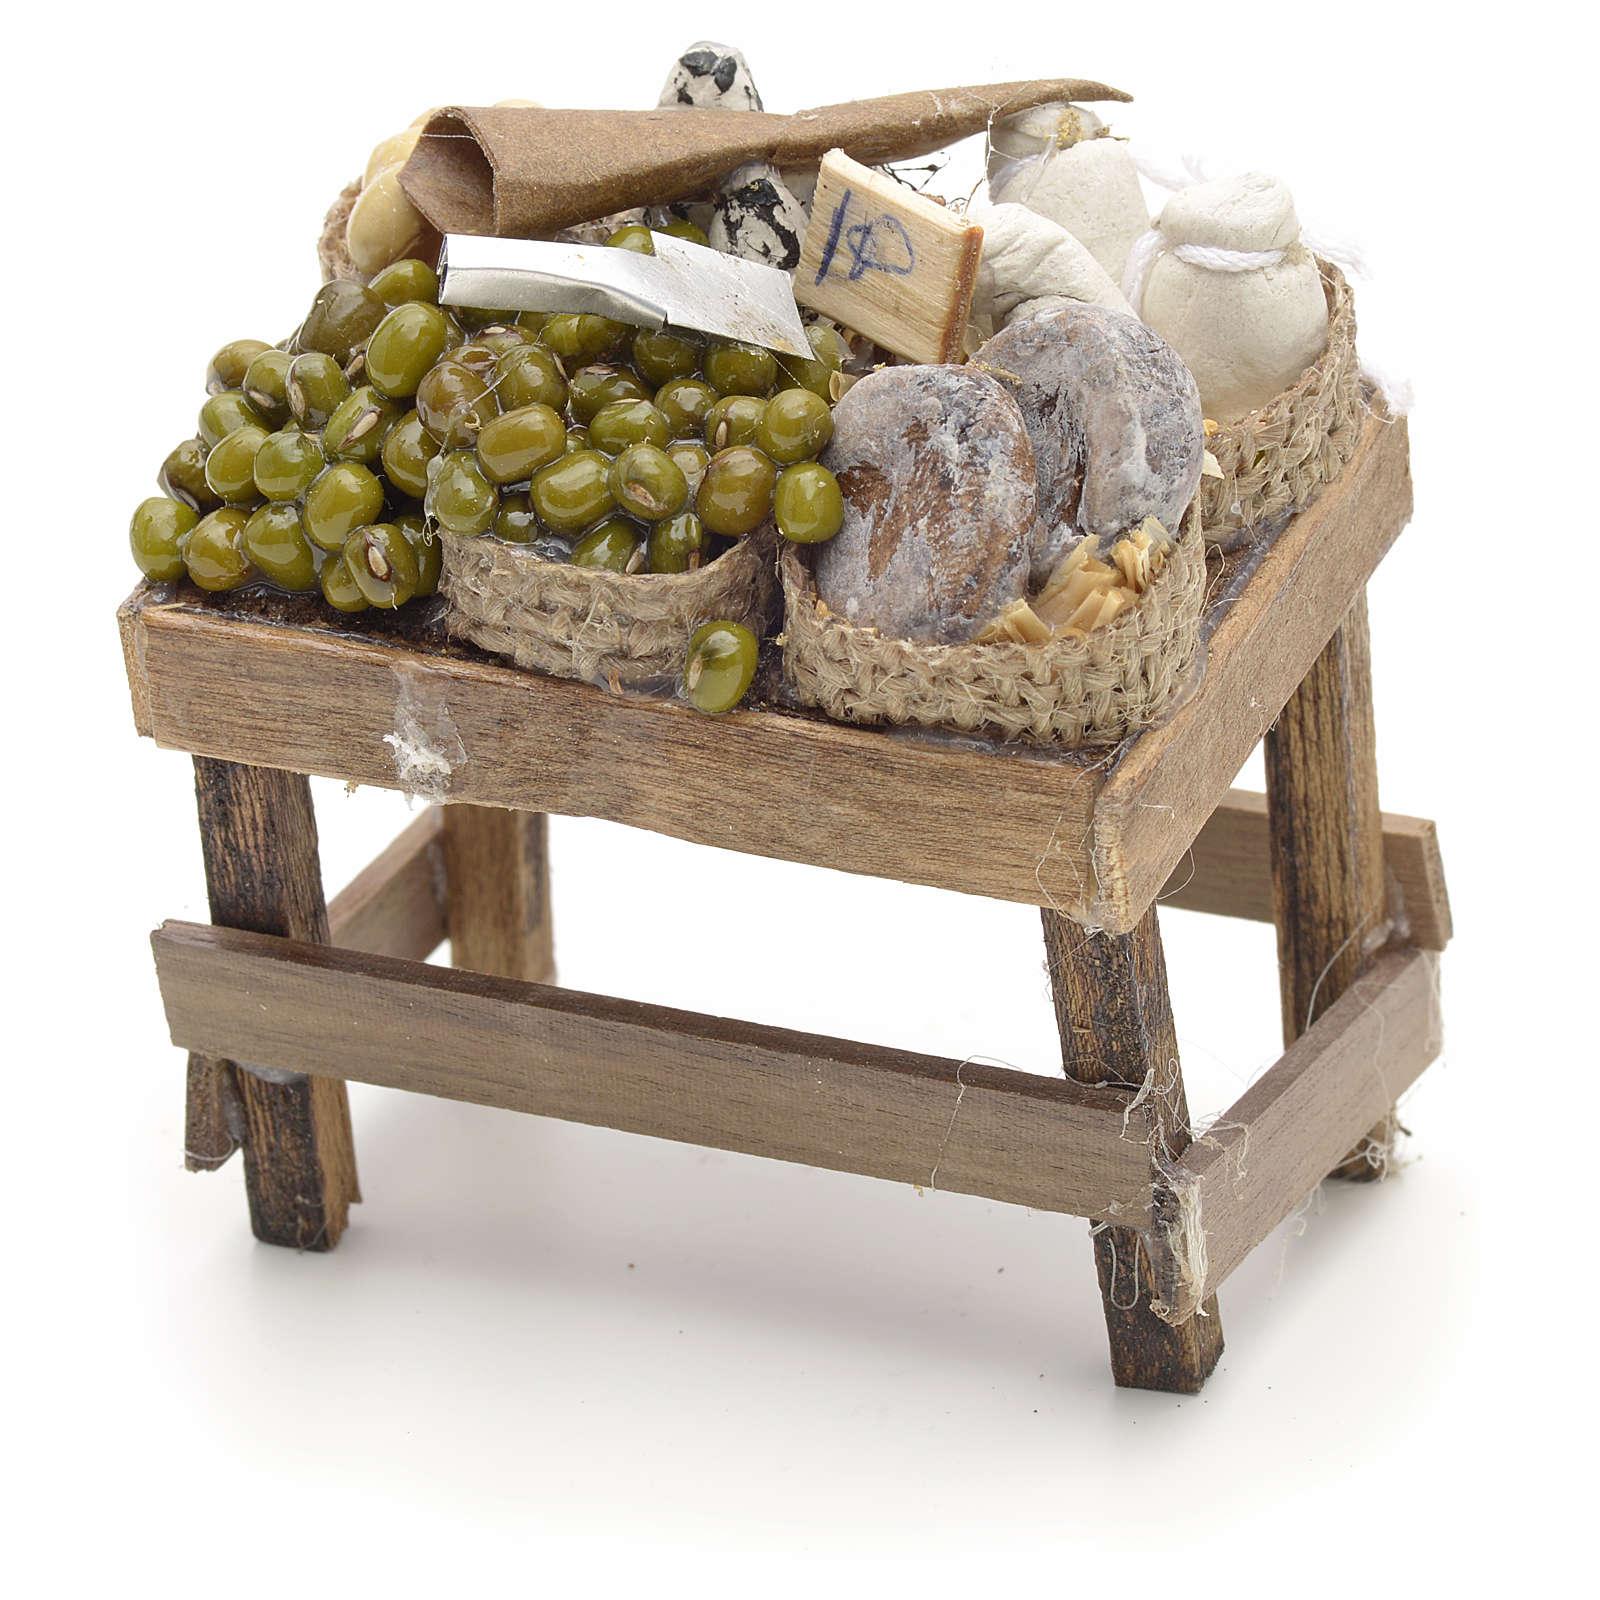 Neapolitan Nativity scene accessory, olive stall 4